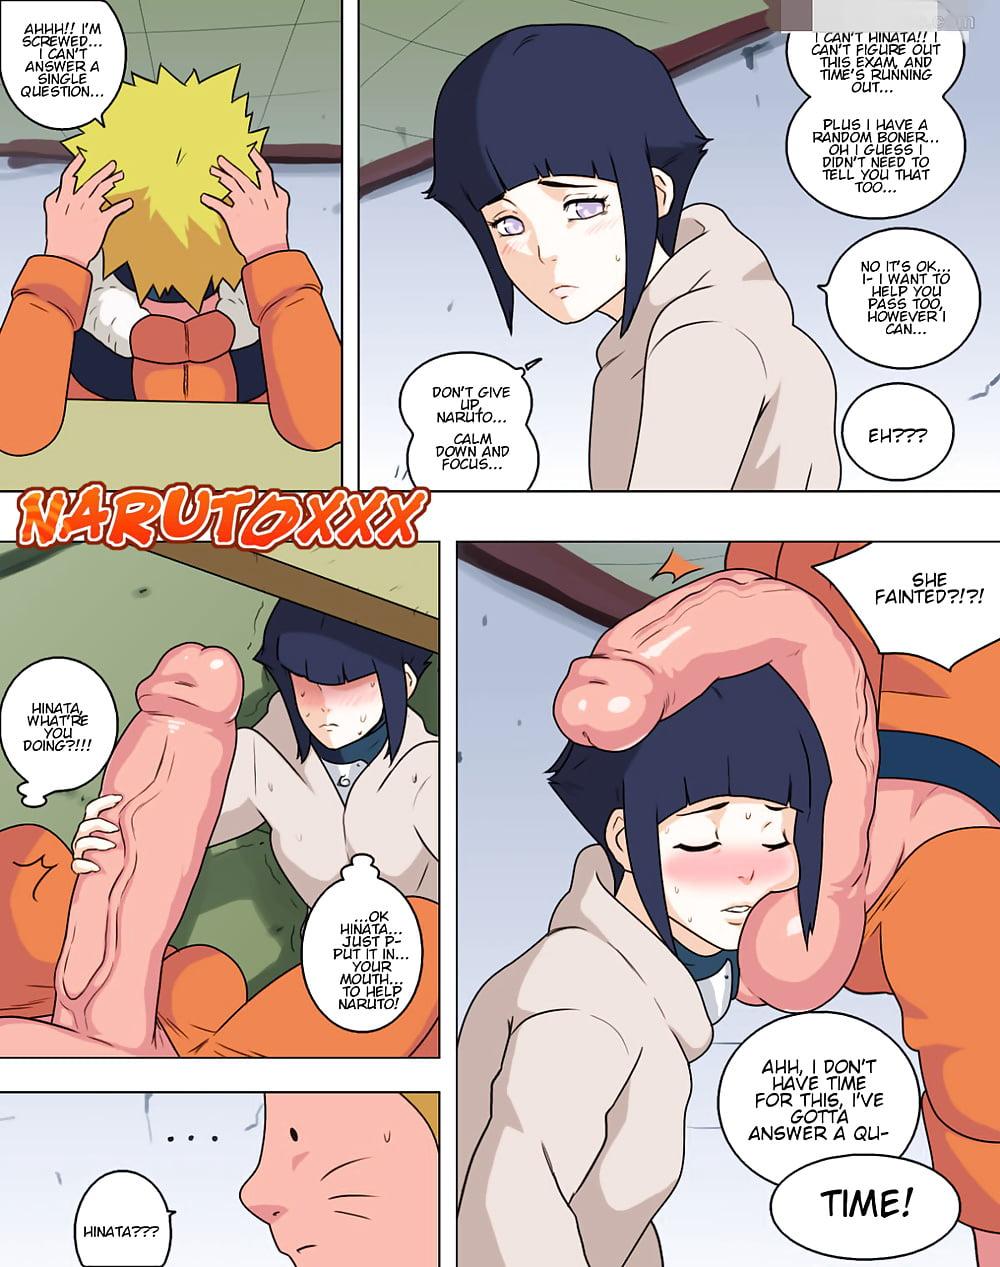 Naruto Xxx see and save as naruto xxx porn pict - 4crot